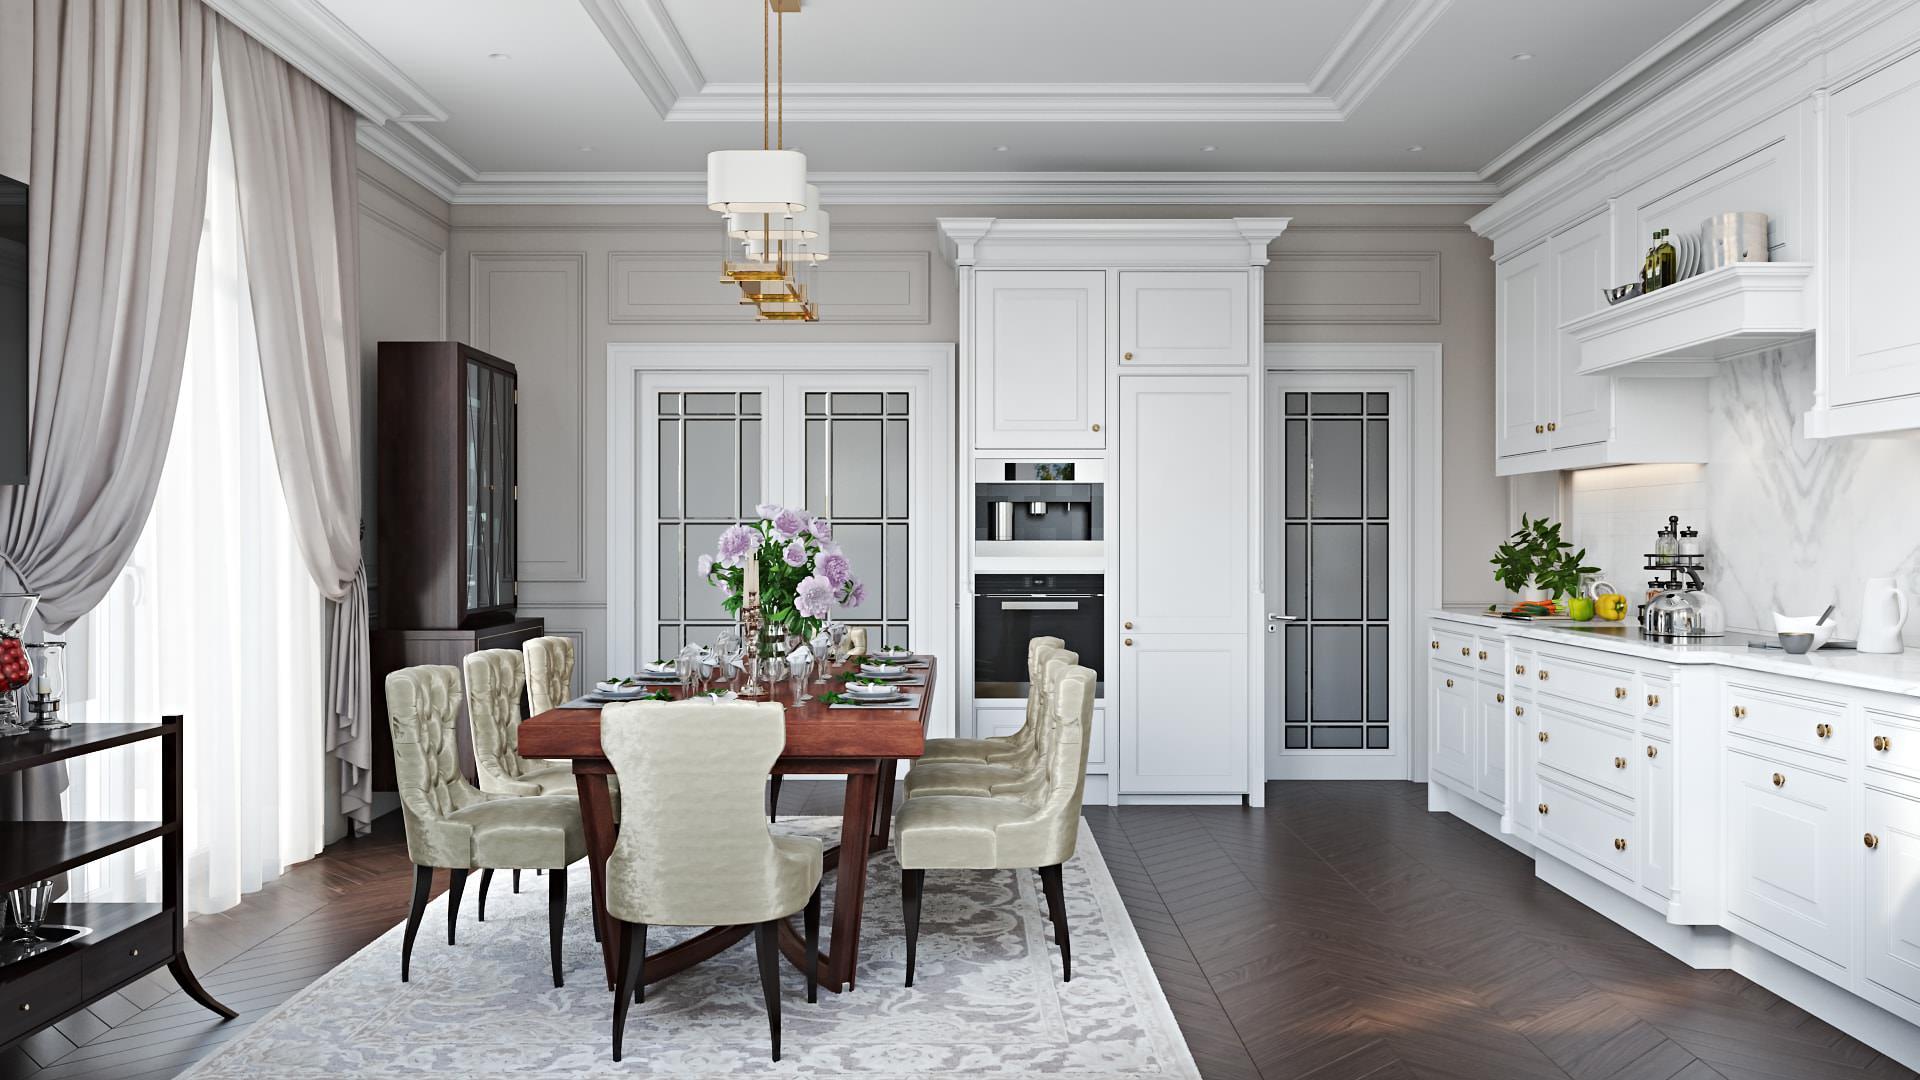 3D Design Rendering Showcasing Kitchen Interior In Pure White